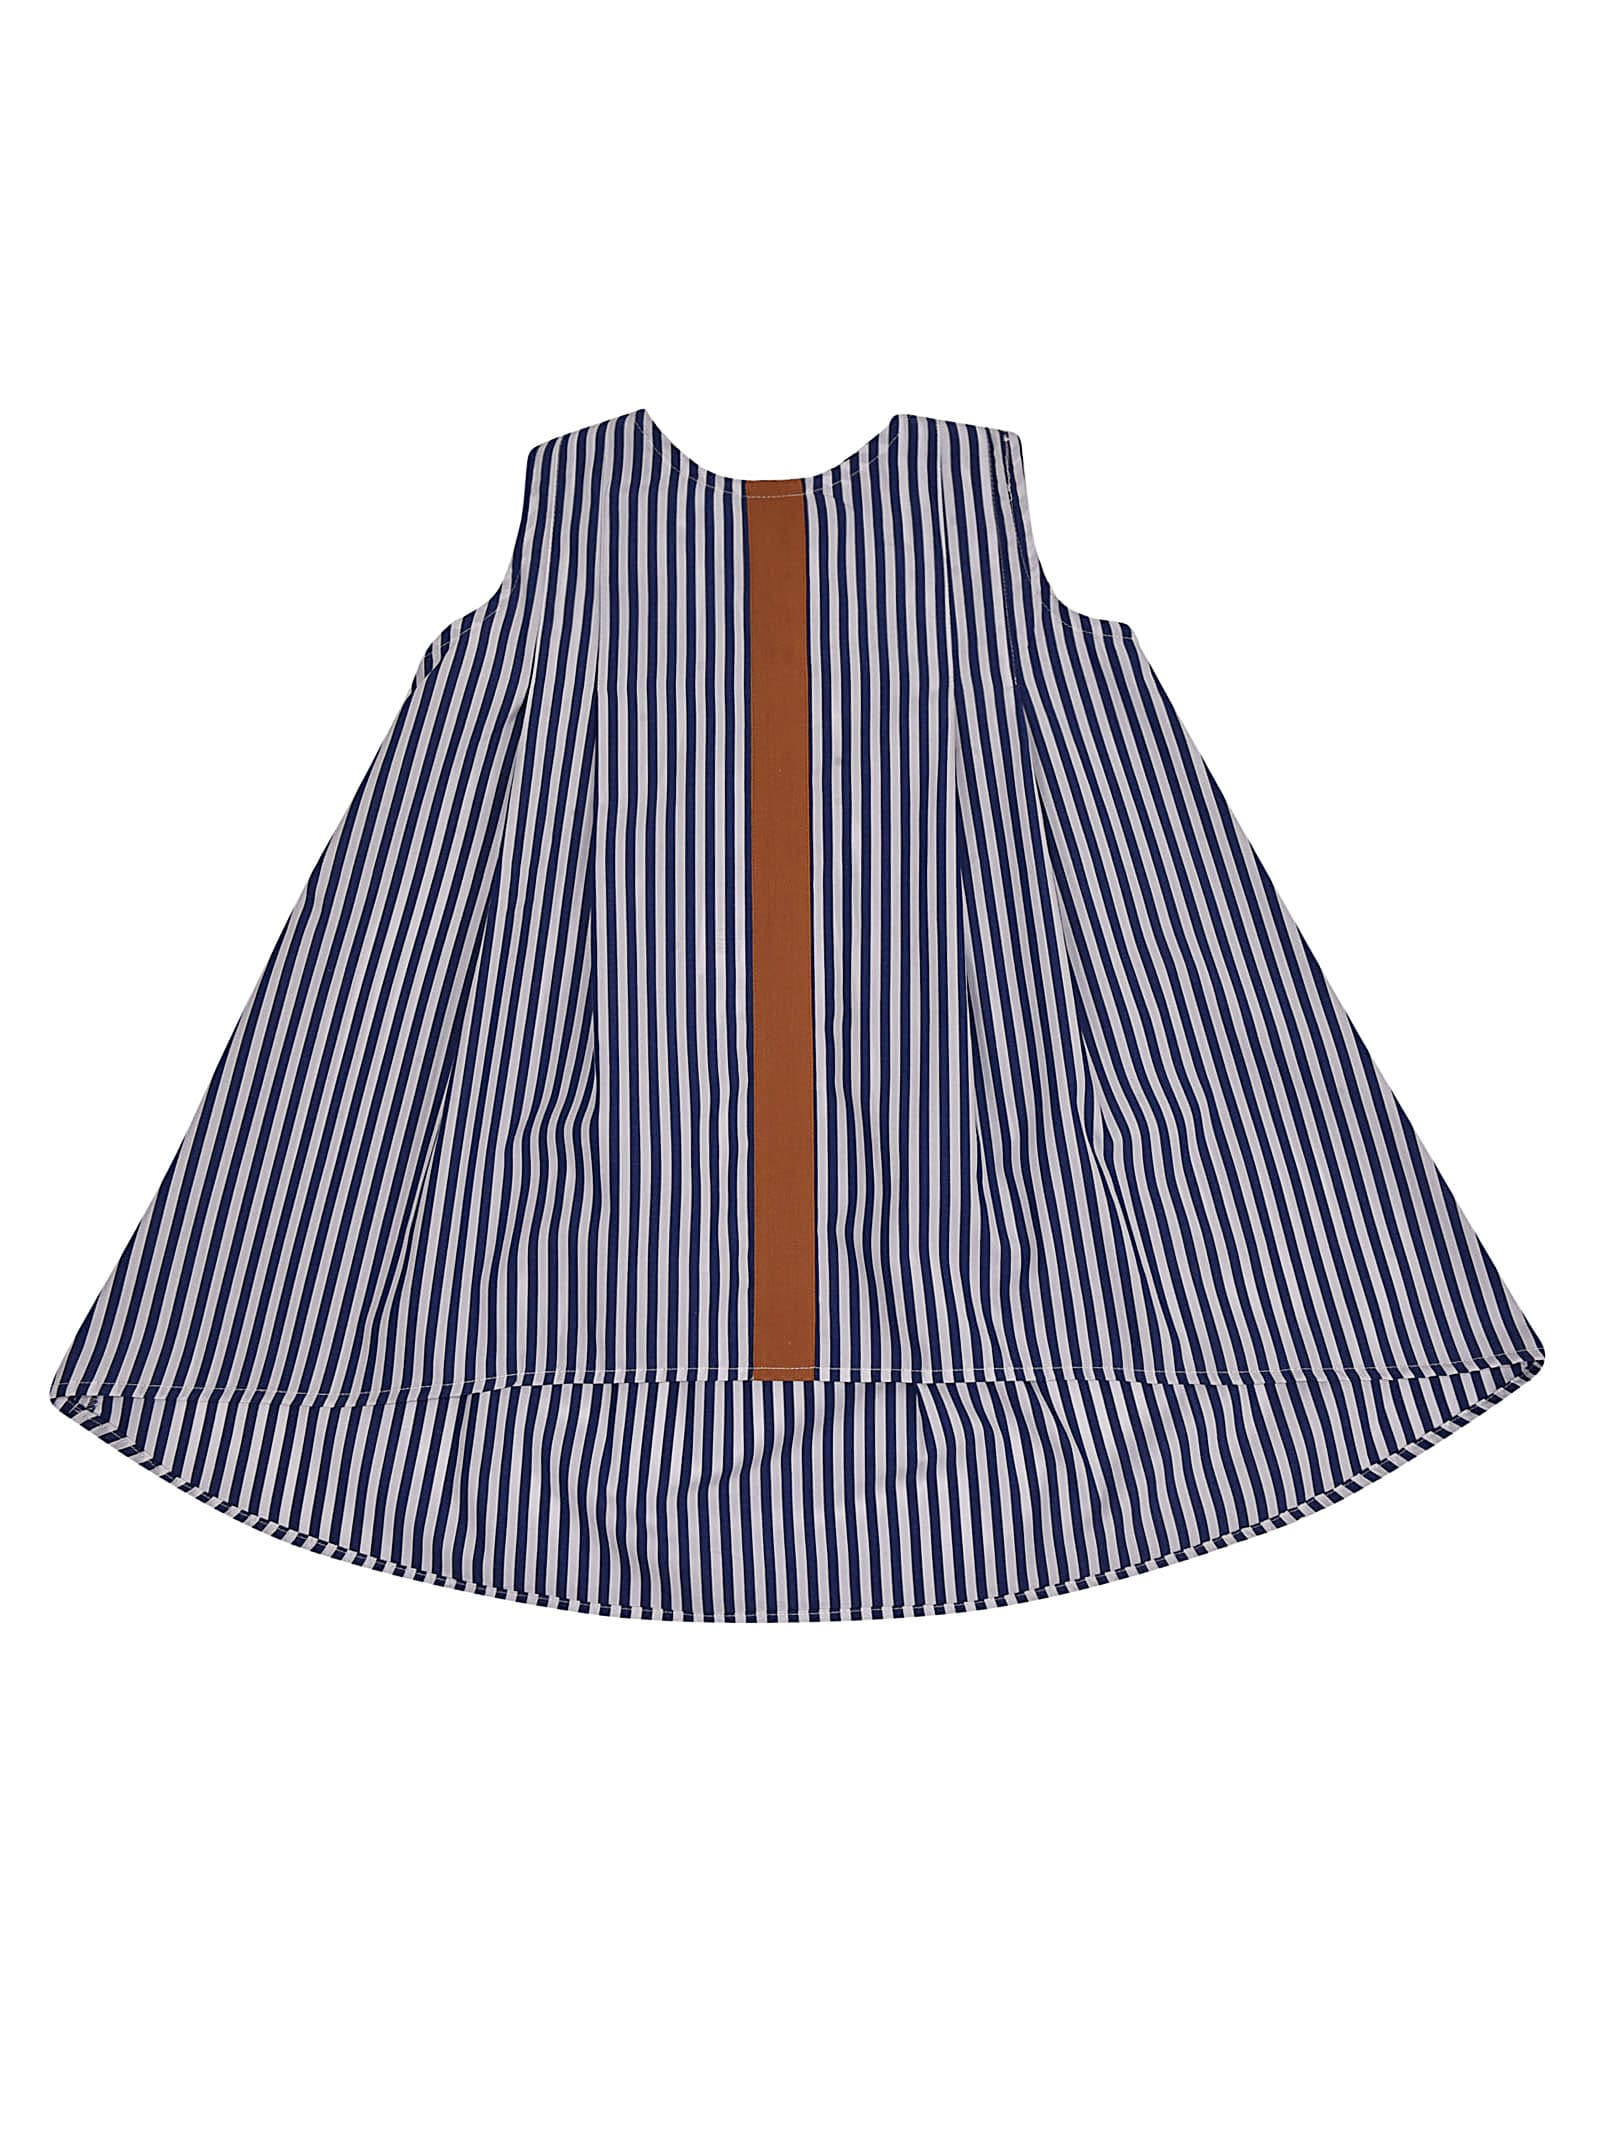 Buy Giro Quadro Striped Dress online, shop Giro Quadro with free shipping